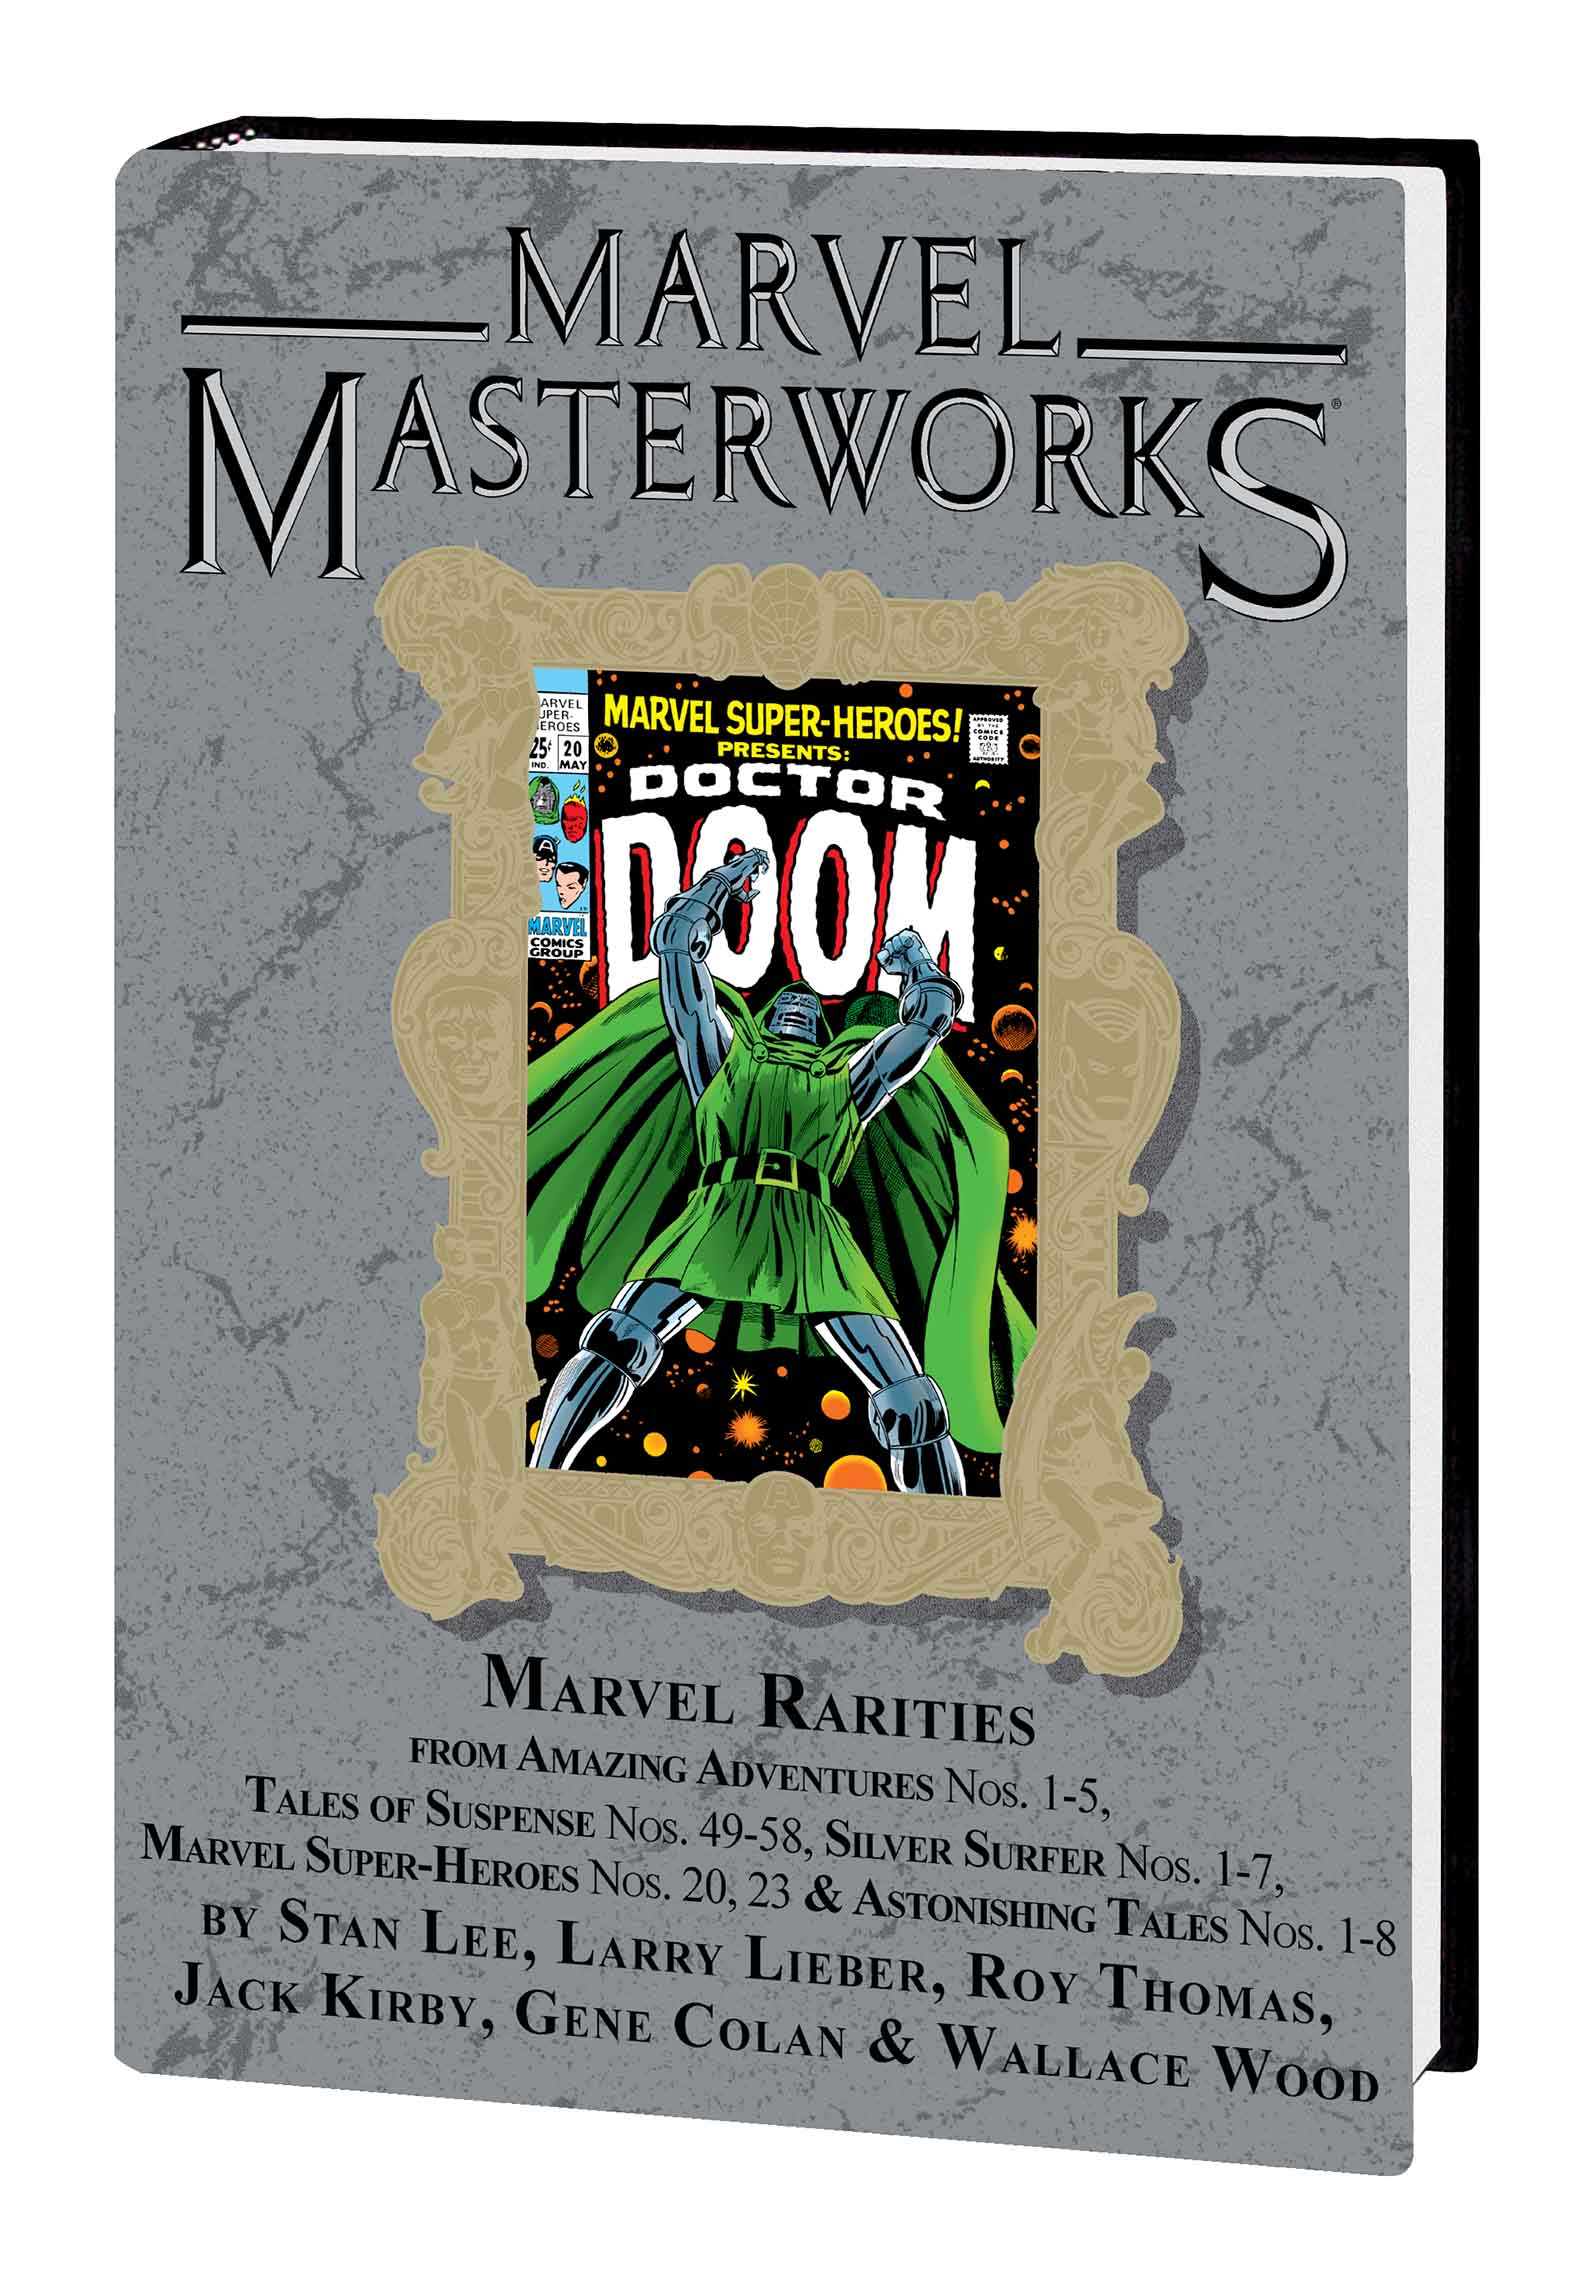 Marvel Masterworks: Marvel Rarities (Hardcover)